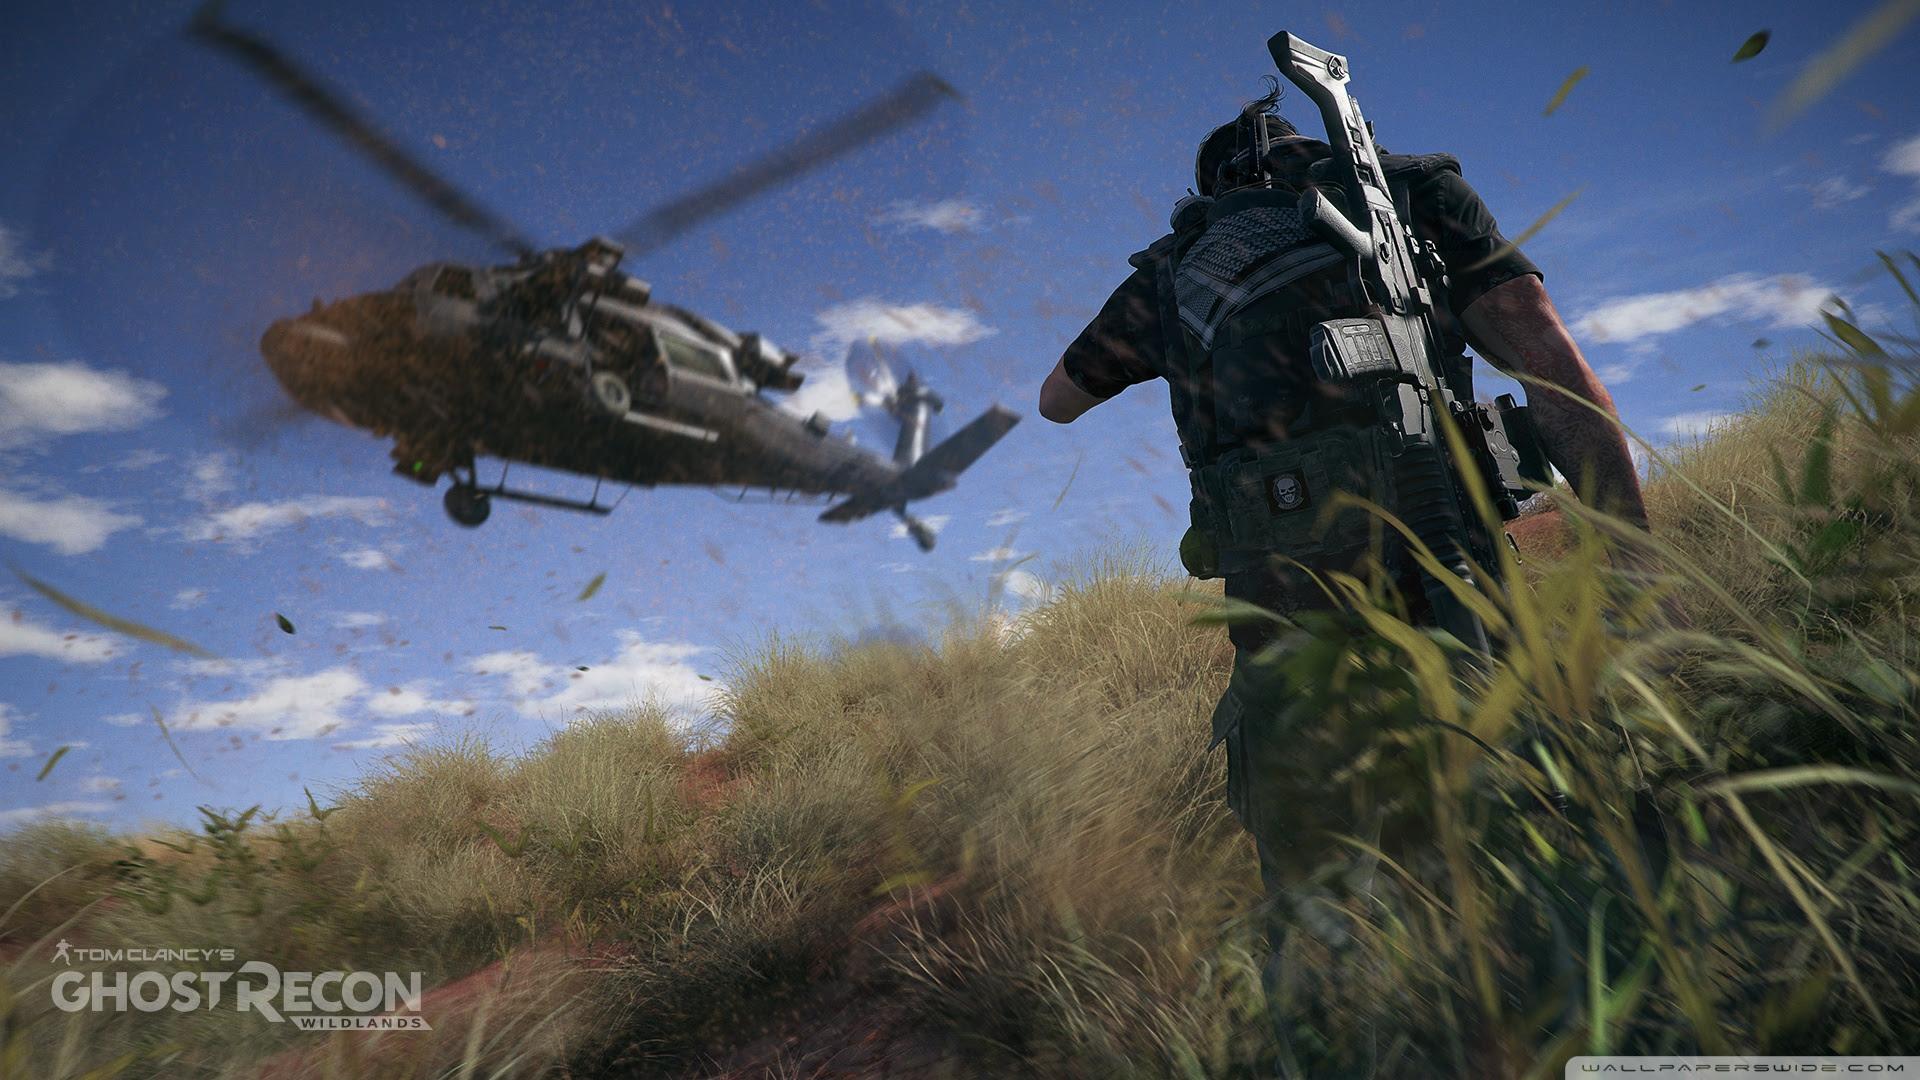 Tom Clancy S Ghost Recon Wildlands Helicopter Ultra Hd Desktop